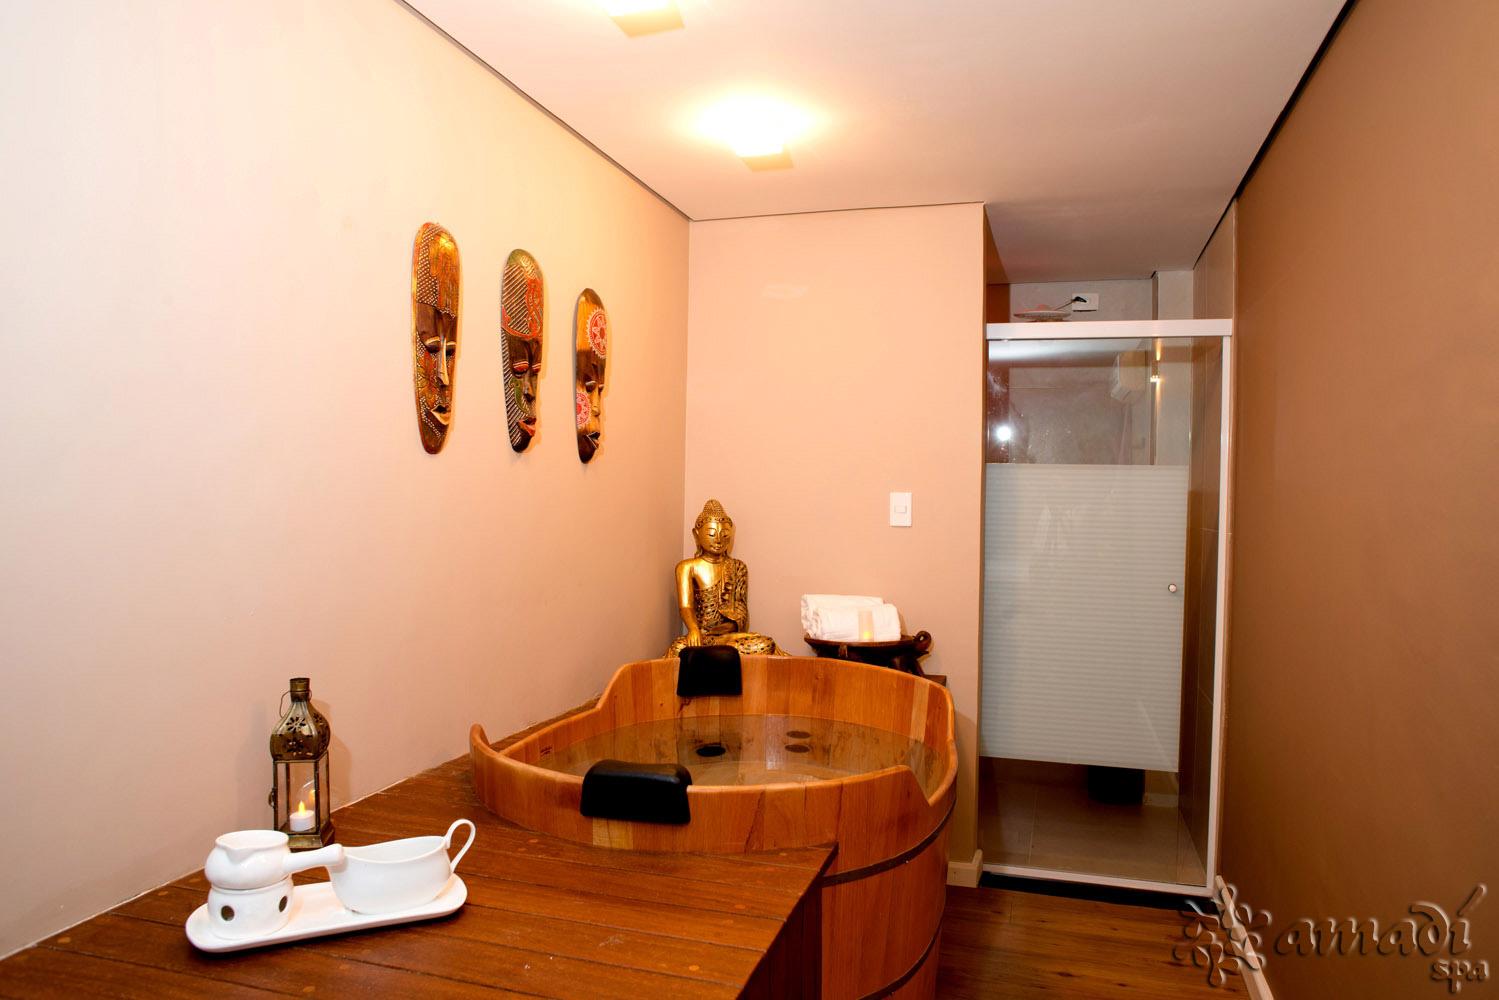 Sala para Casal com Ofurô - Amadí Spa - Moema